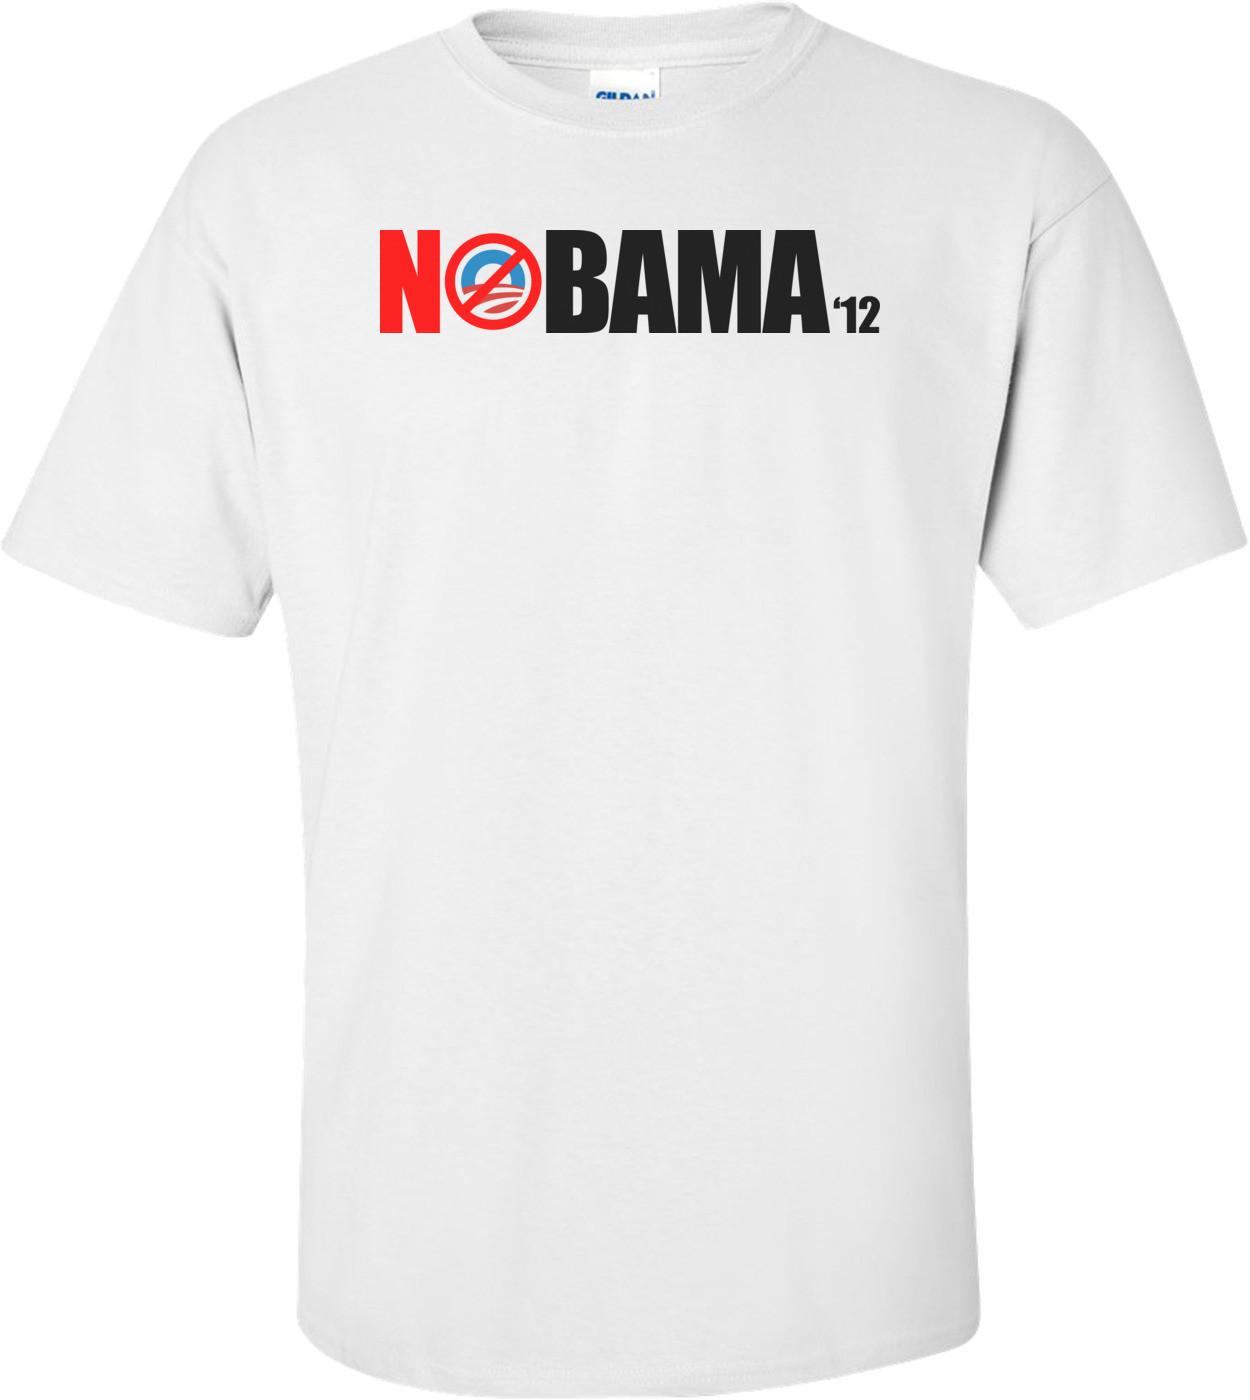 Nobama 2012 - Anti-obama Shirt